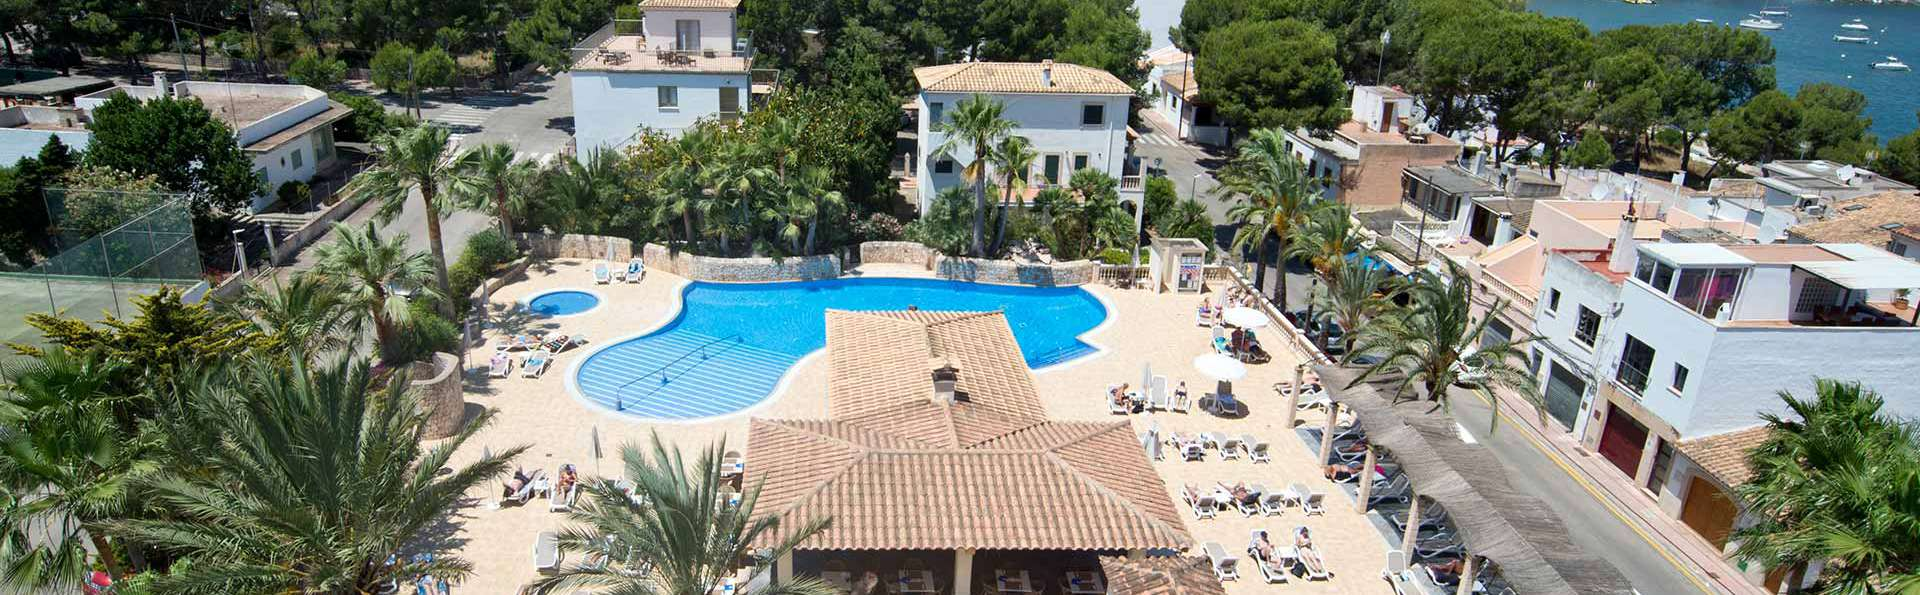 Hotel Vistamar by Pierre & Vacances (inactif) - EDIT_NEW_VIEW_01.jpg